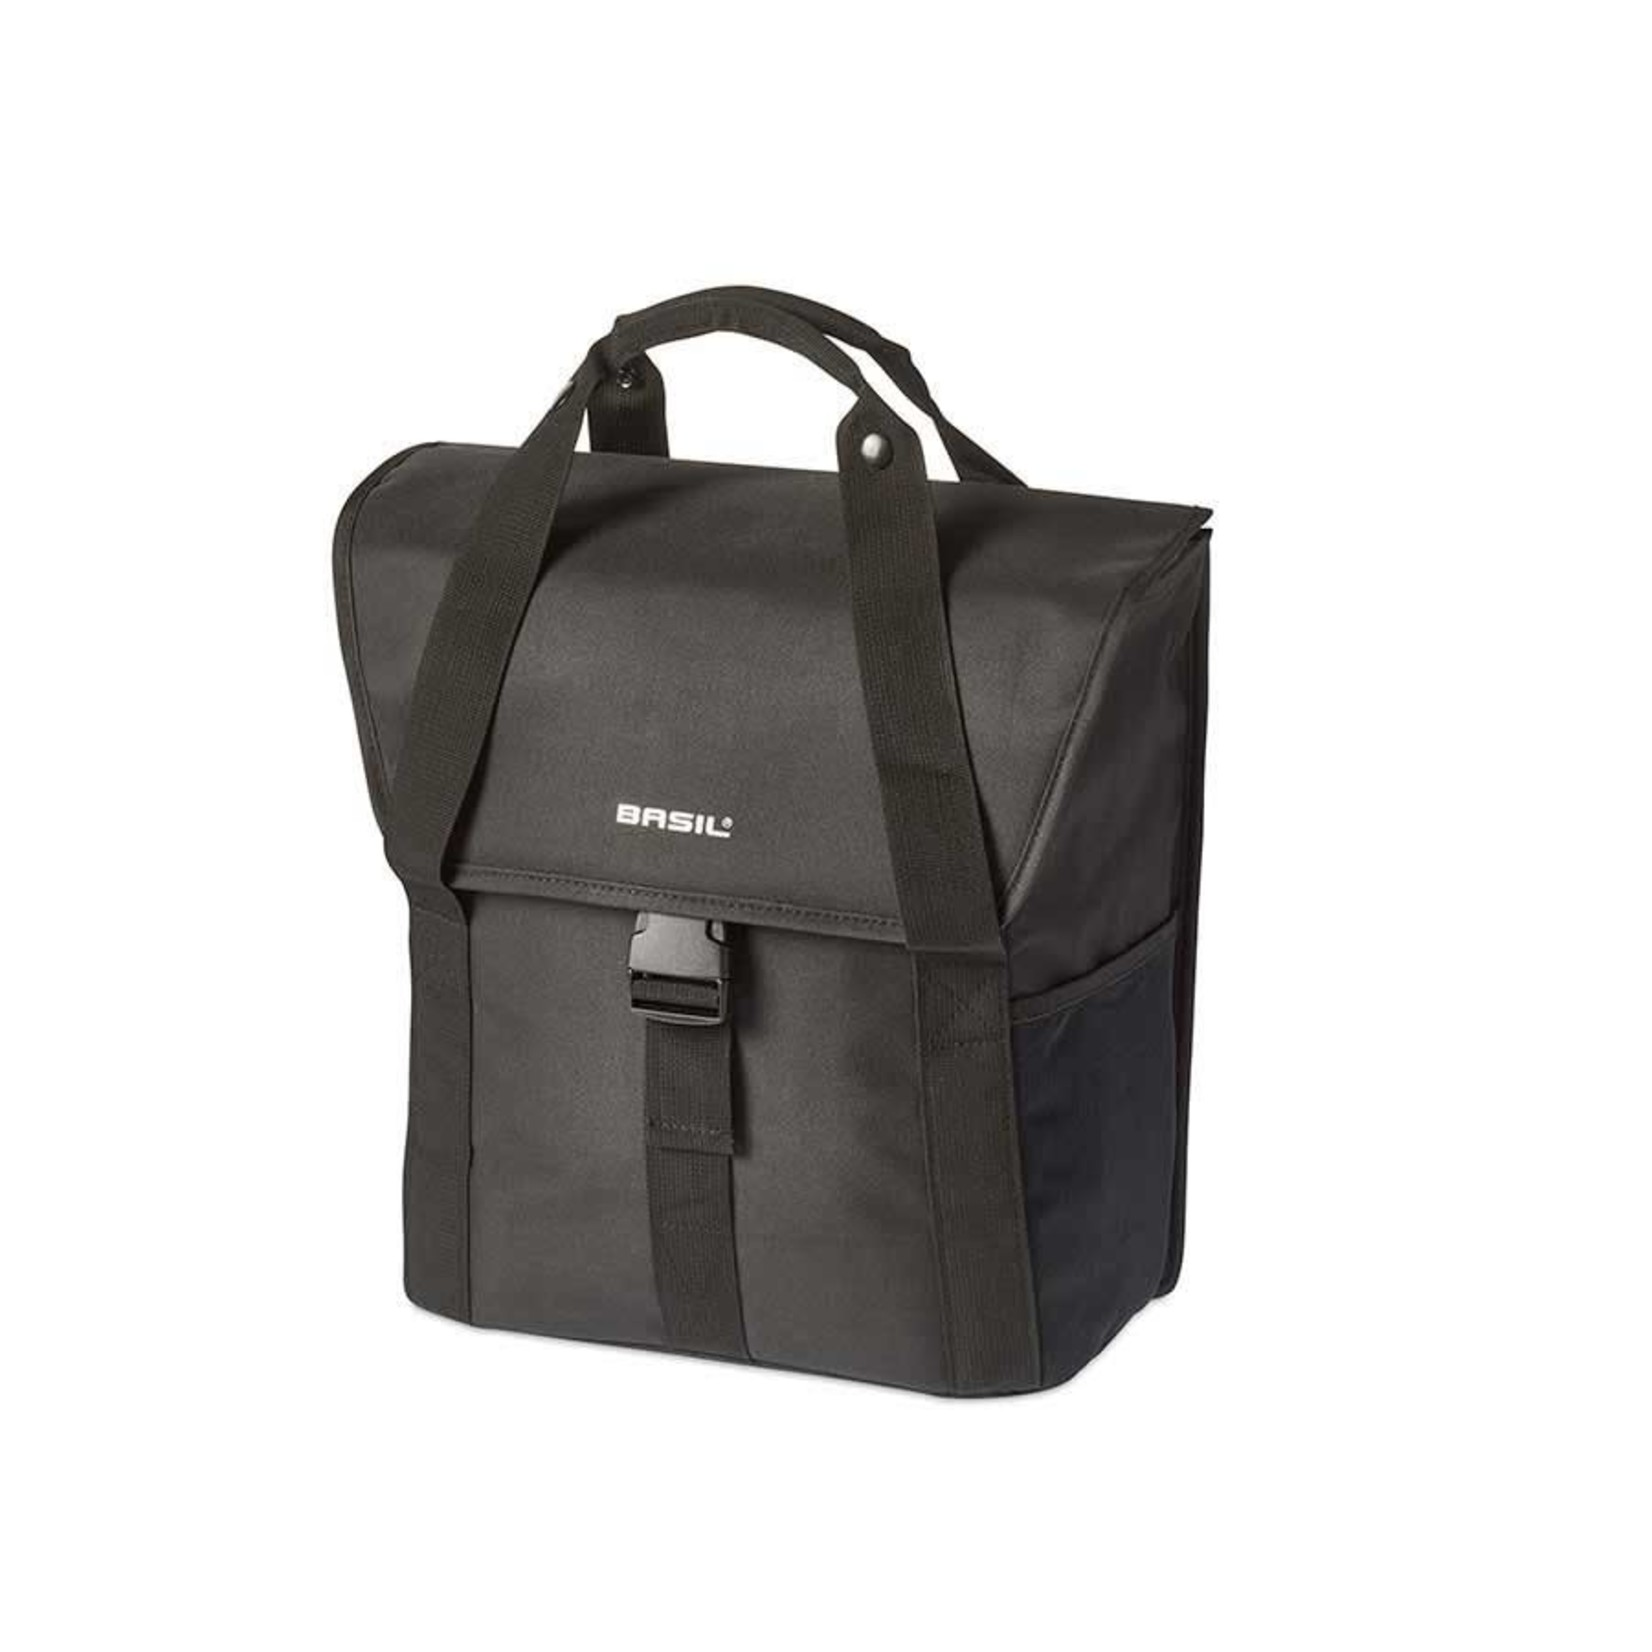 Basil Basil Go Single Bag Pannier